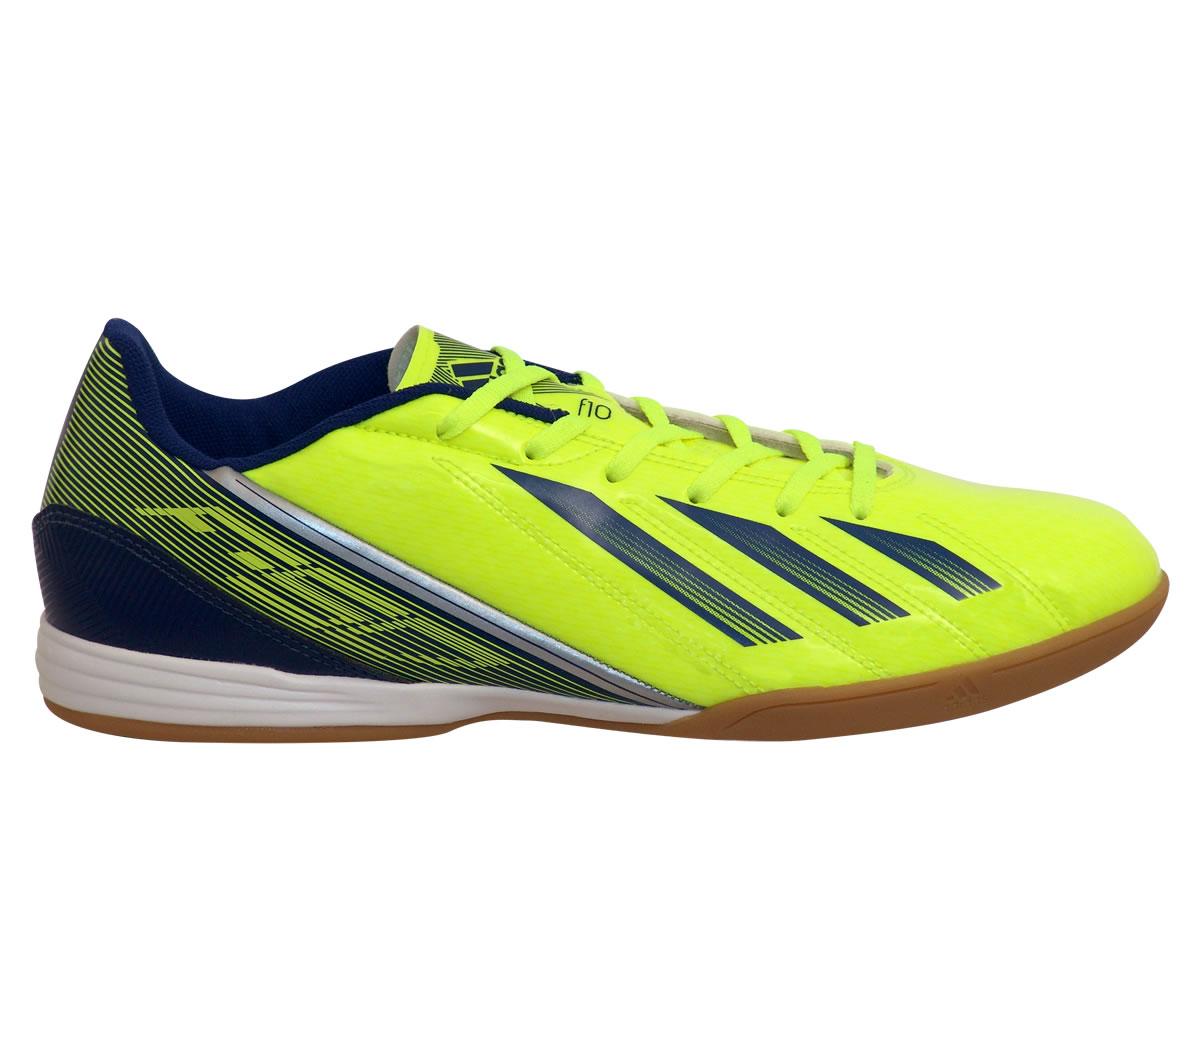 b57085bddc Tênis Adidas F10 Futsal Amarelo - Mundo do Futebol